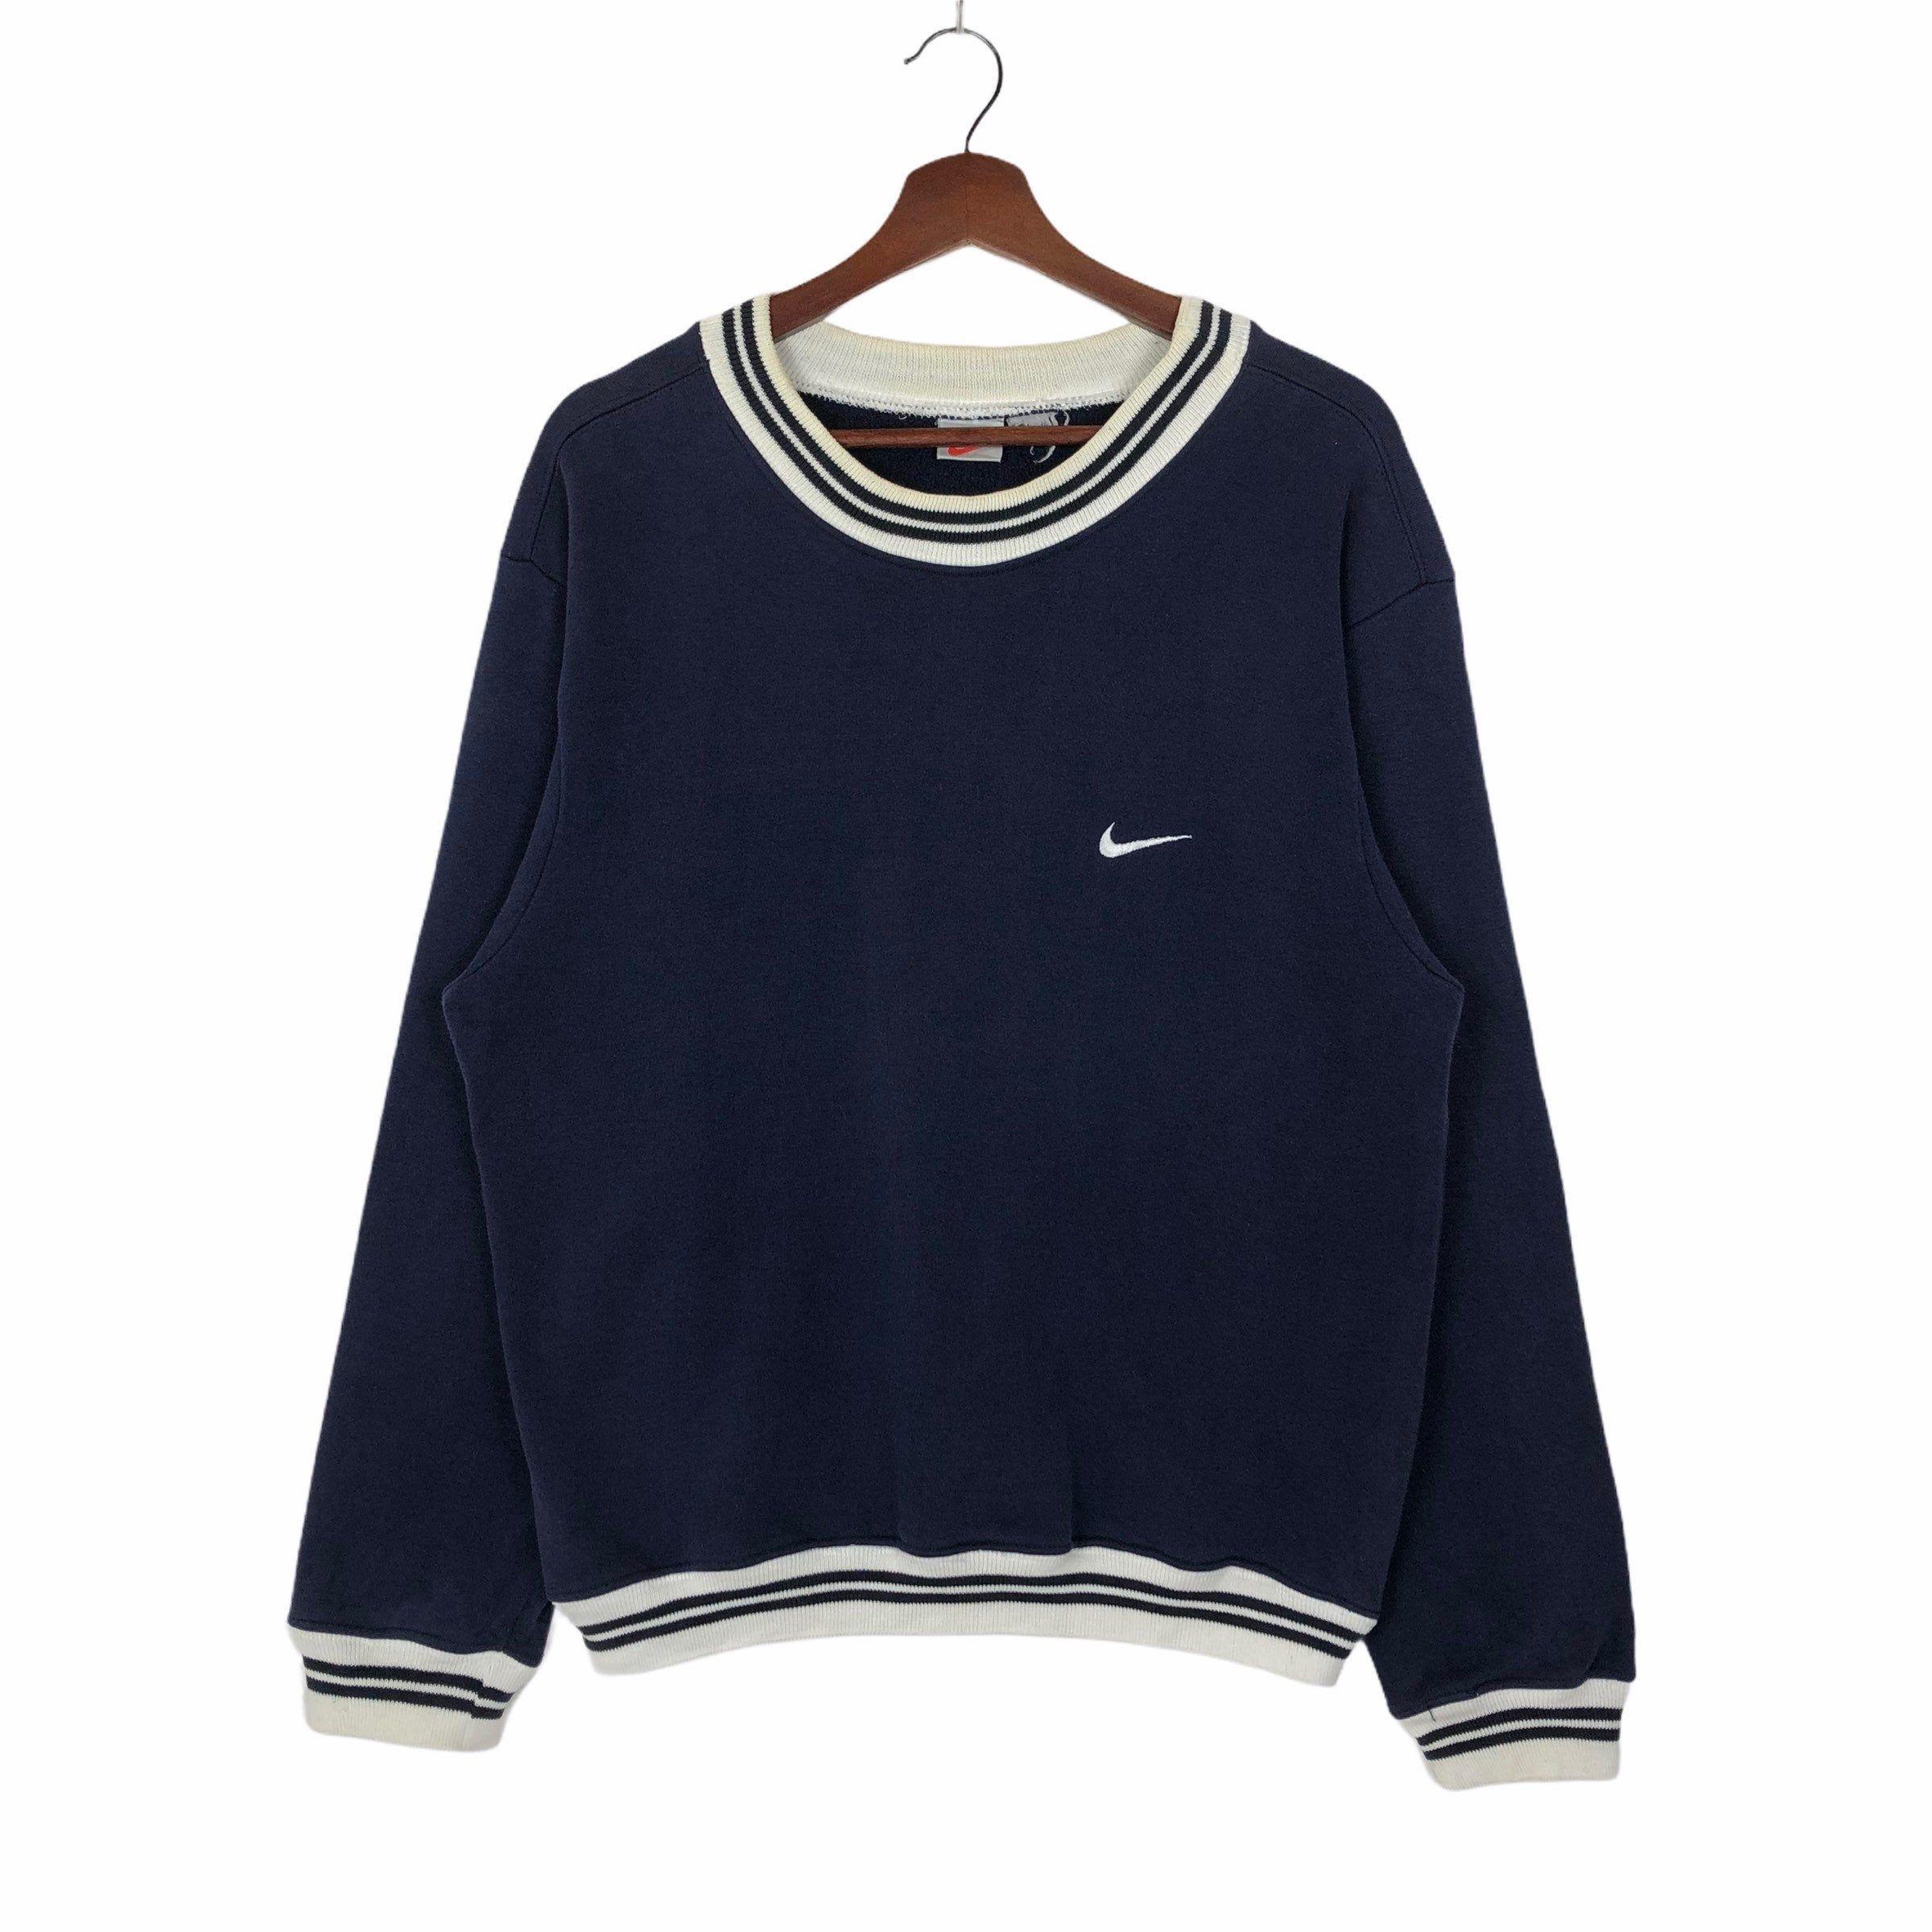 Vintage 90s Nike Swoosh Sweatshirt Nike Ringer Sweatshirt Etsy In 2021 Sweatshirts Vintage Sweatshirt Tomboy Style Outfits [ 2400 x 2400 Pixel ]